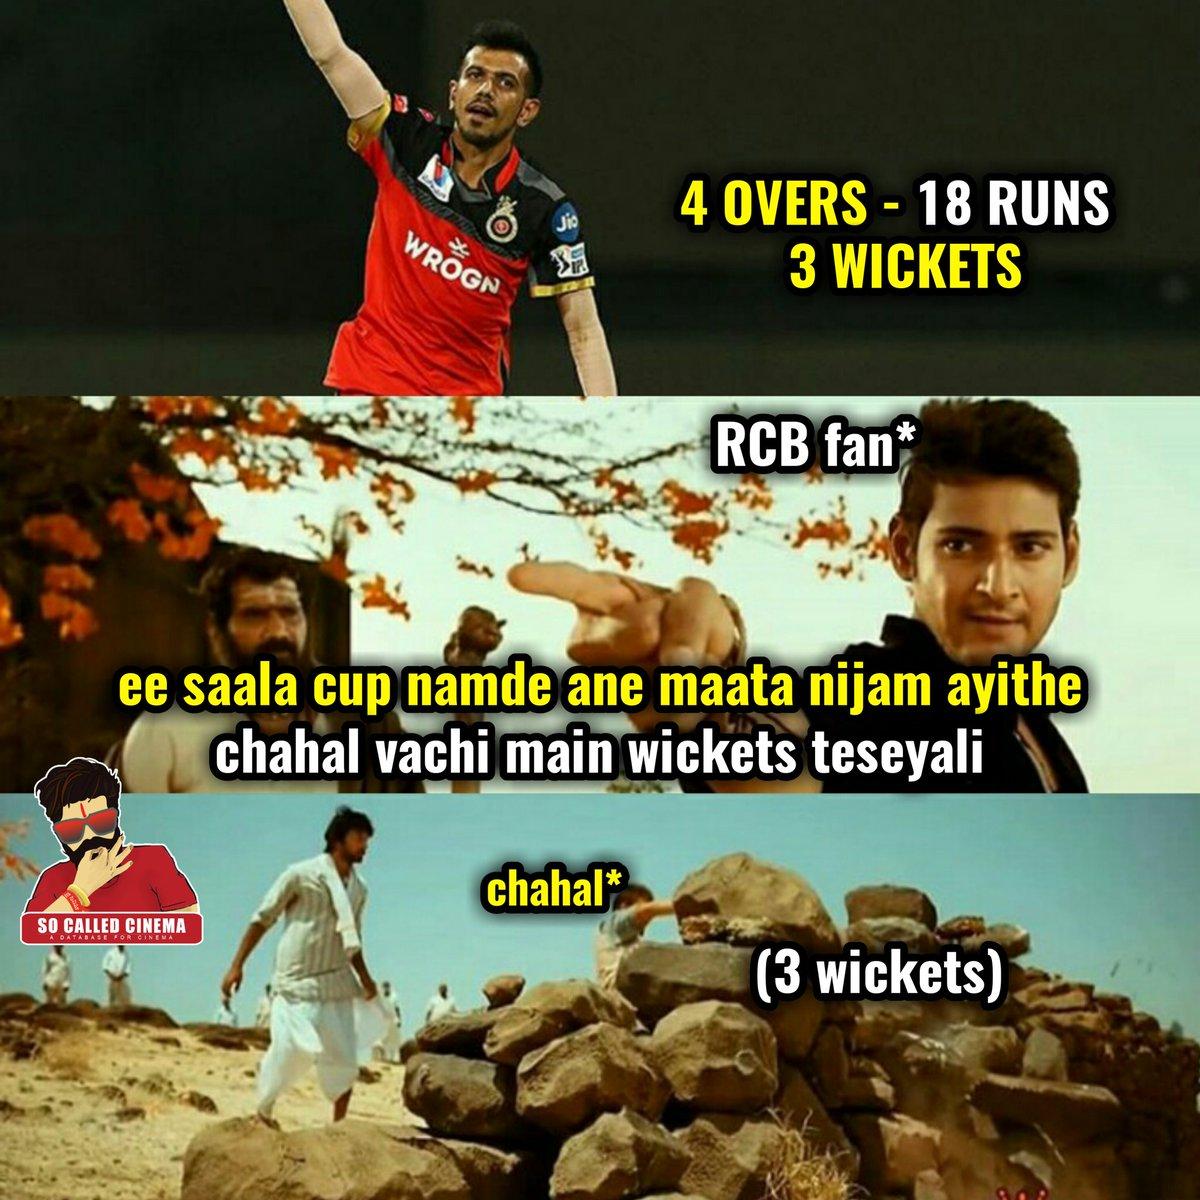 During Chahal final over..!!  #SRHvRCB #IPL2020 #RCB #SRH #SoCalledCinema https://t.co/jmx5VSs7MD